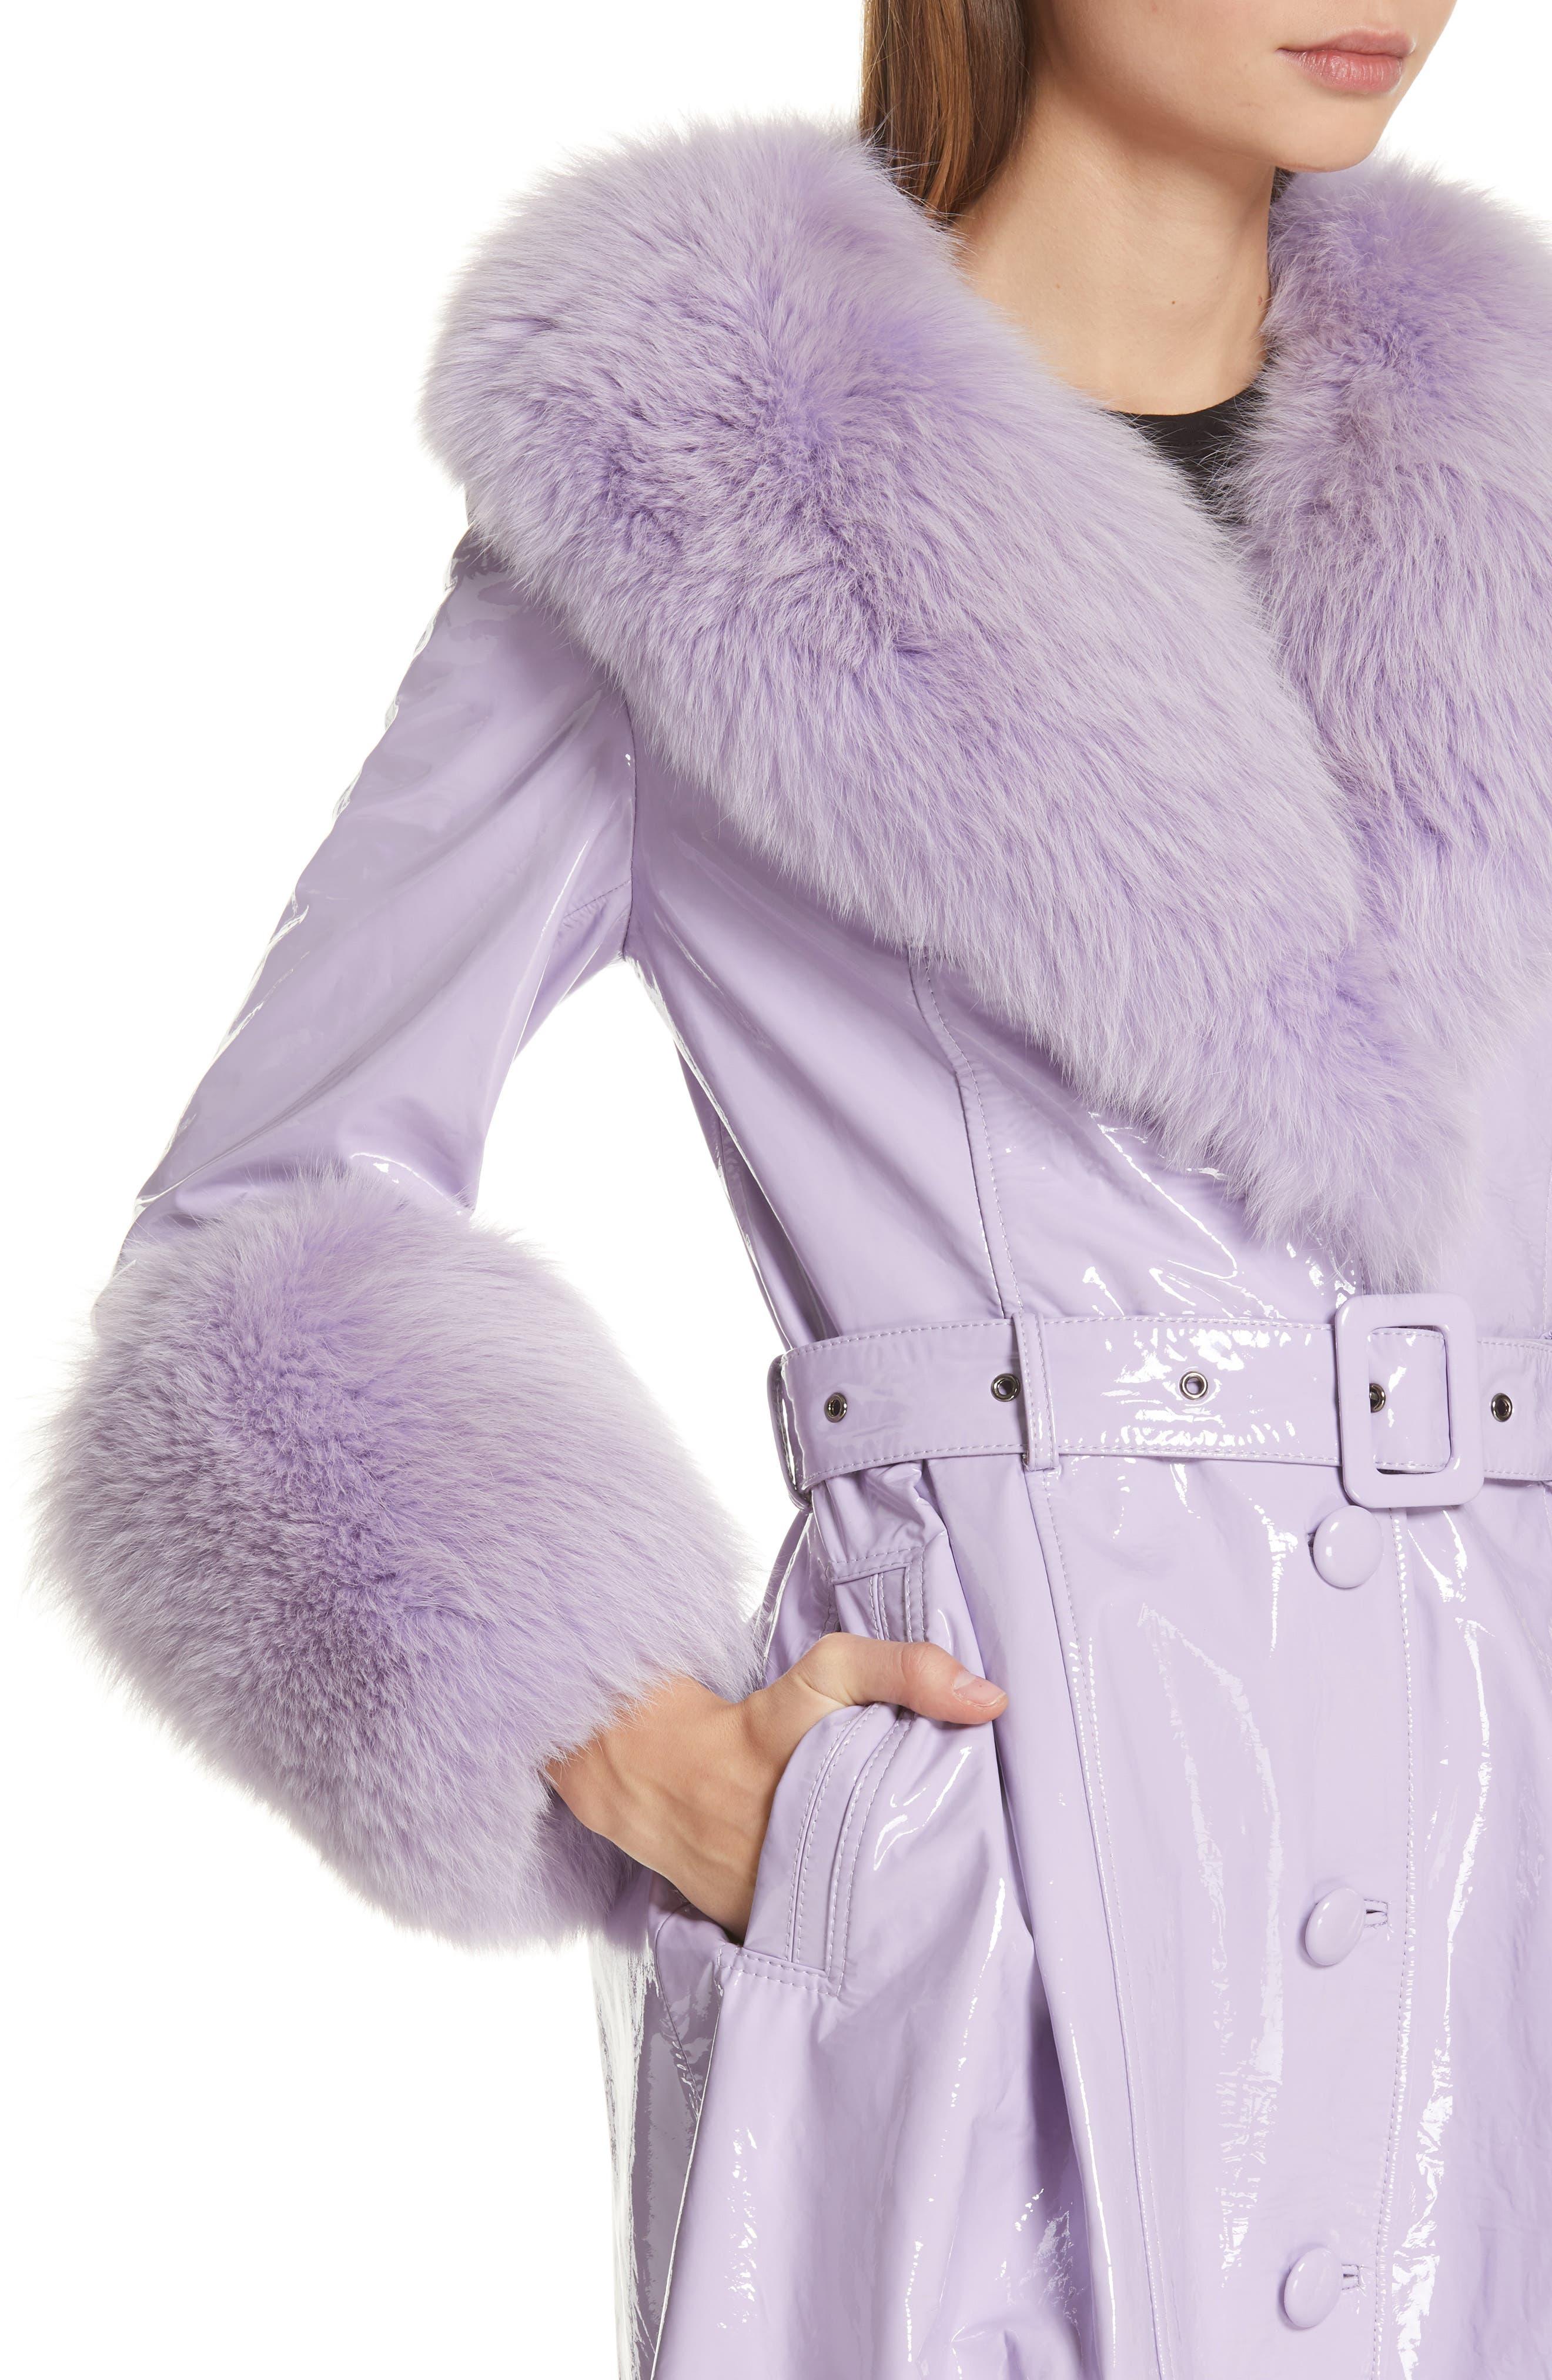 SAKS POTTS, Patent Leather Coat with Genuine Fox Fur Trim, Alternate thumbnail 5, color, LAVENDER